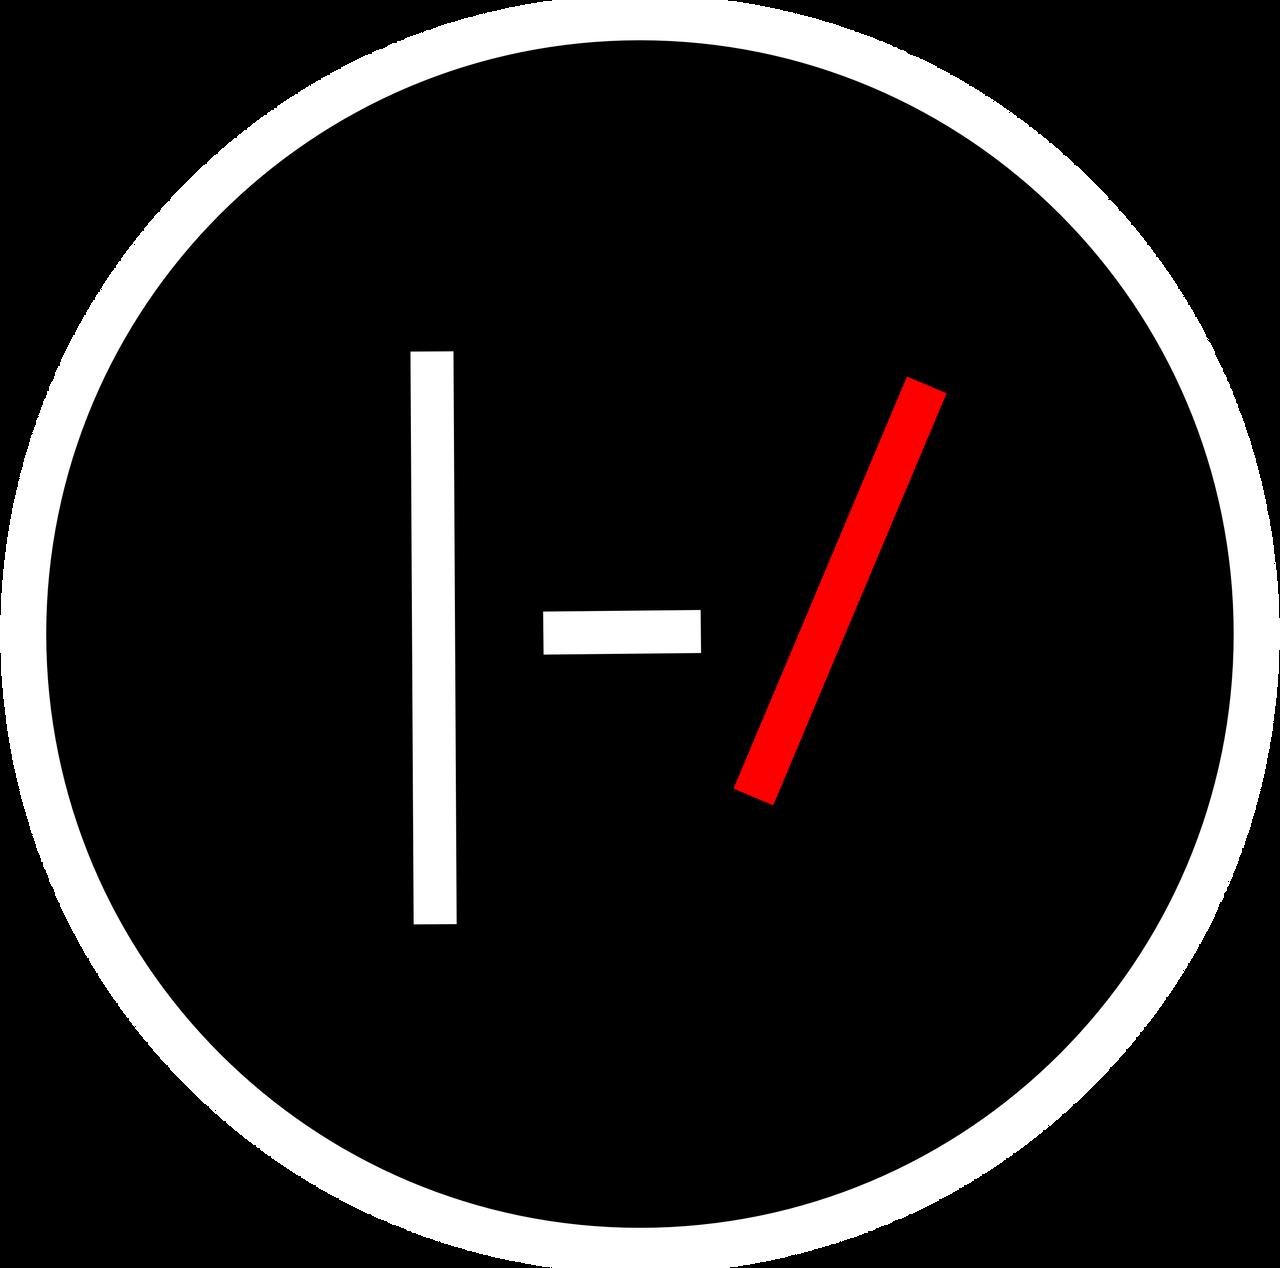 New Twenty One Pilots Logo By Fieldsofdaisies On Deviantart